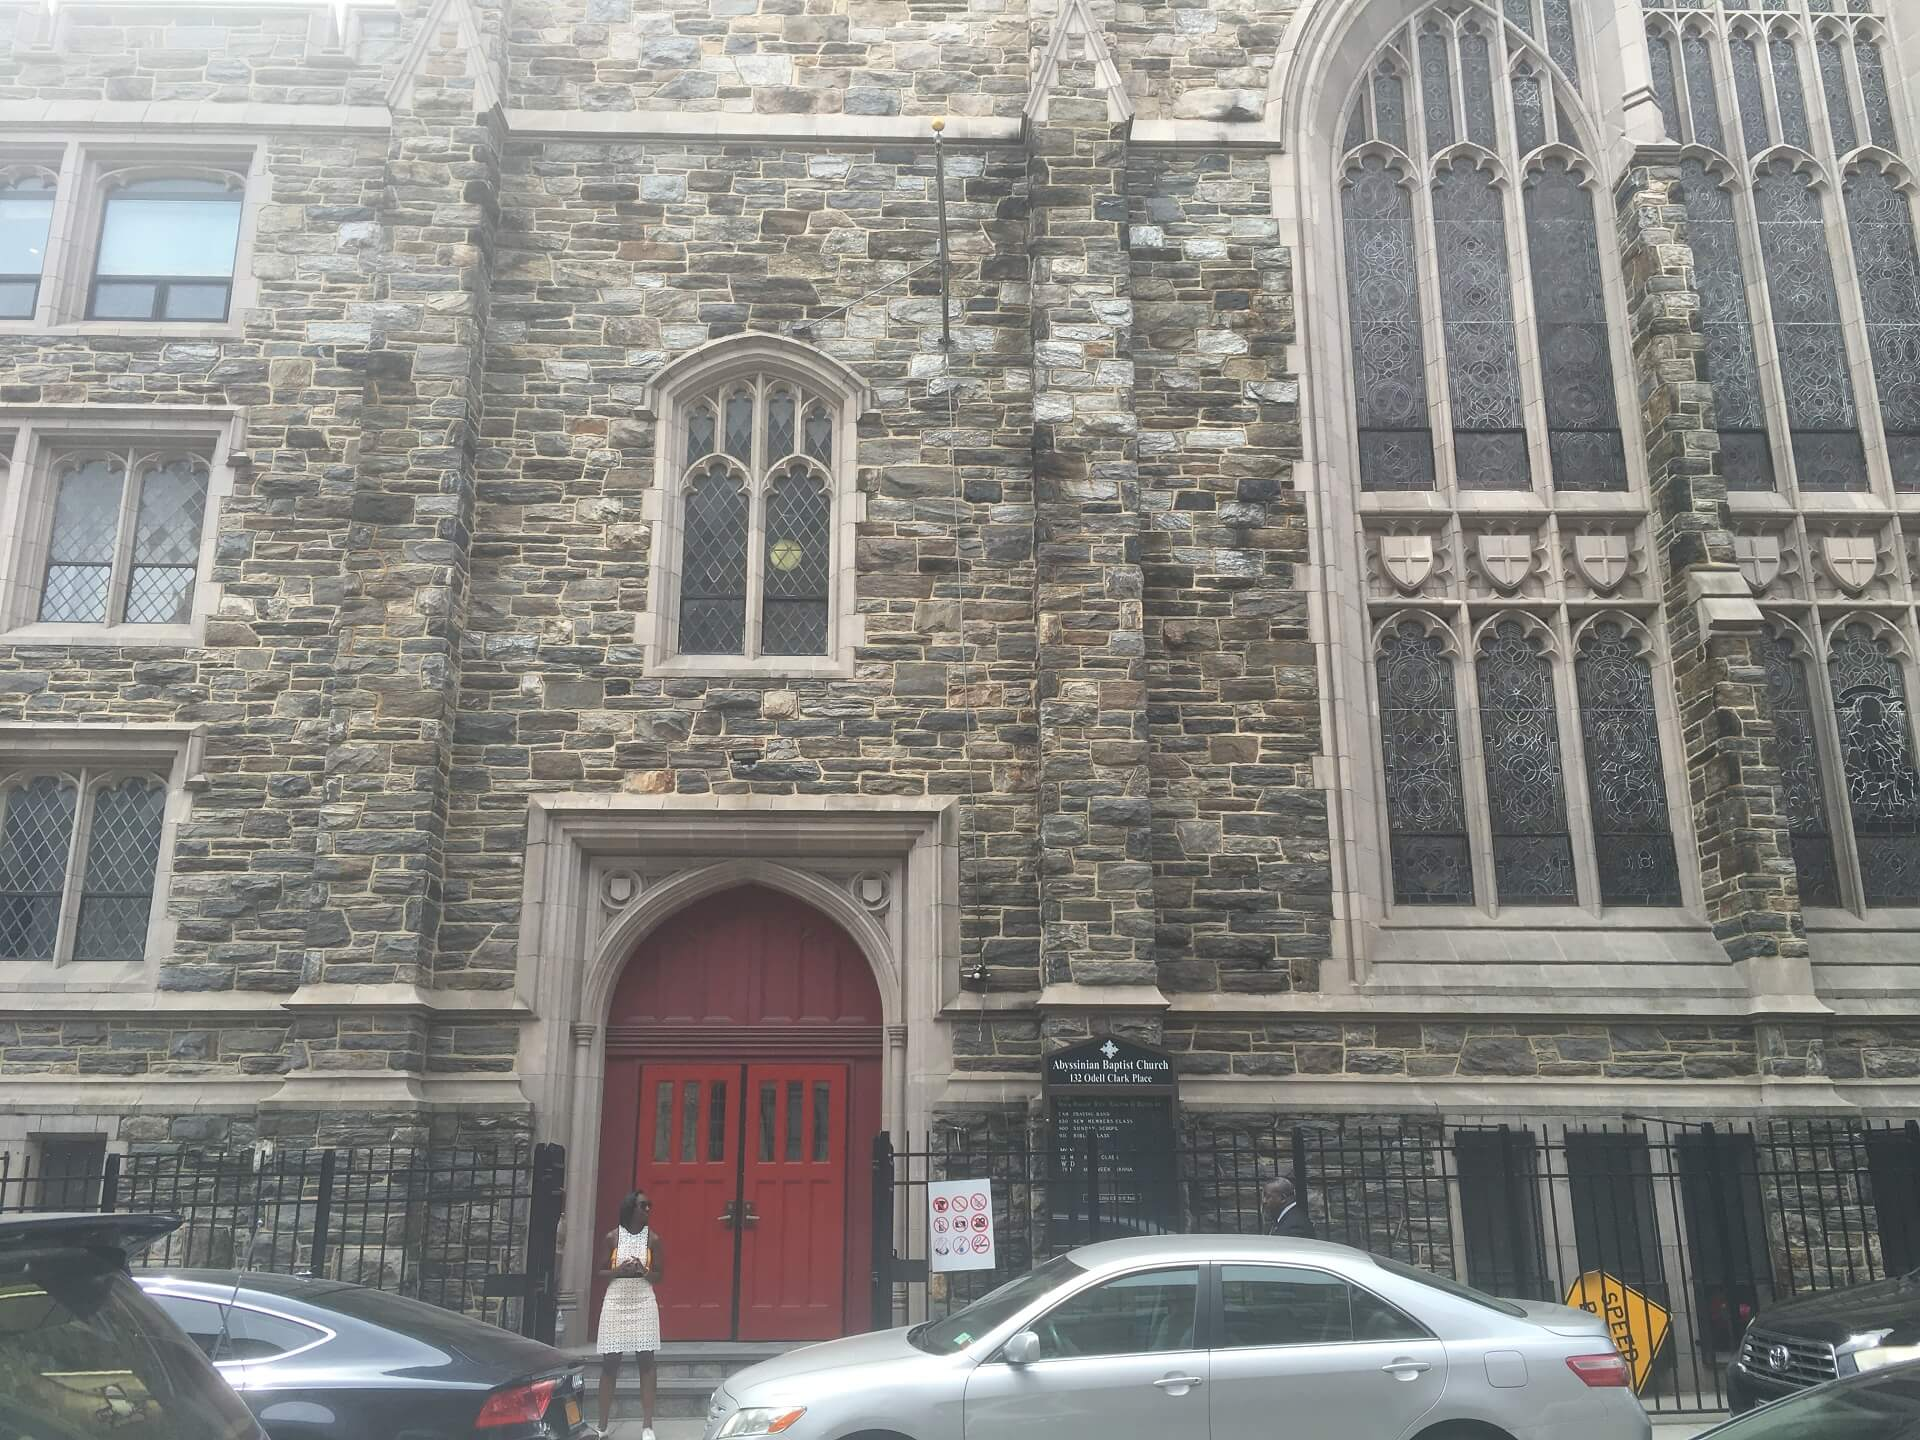 abyssinian church - Travels with Talek